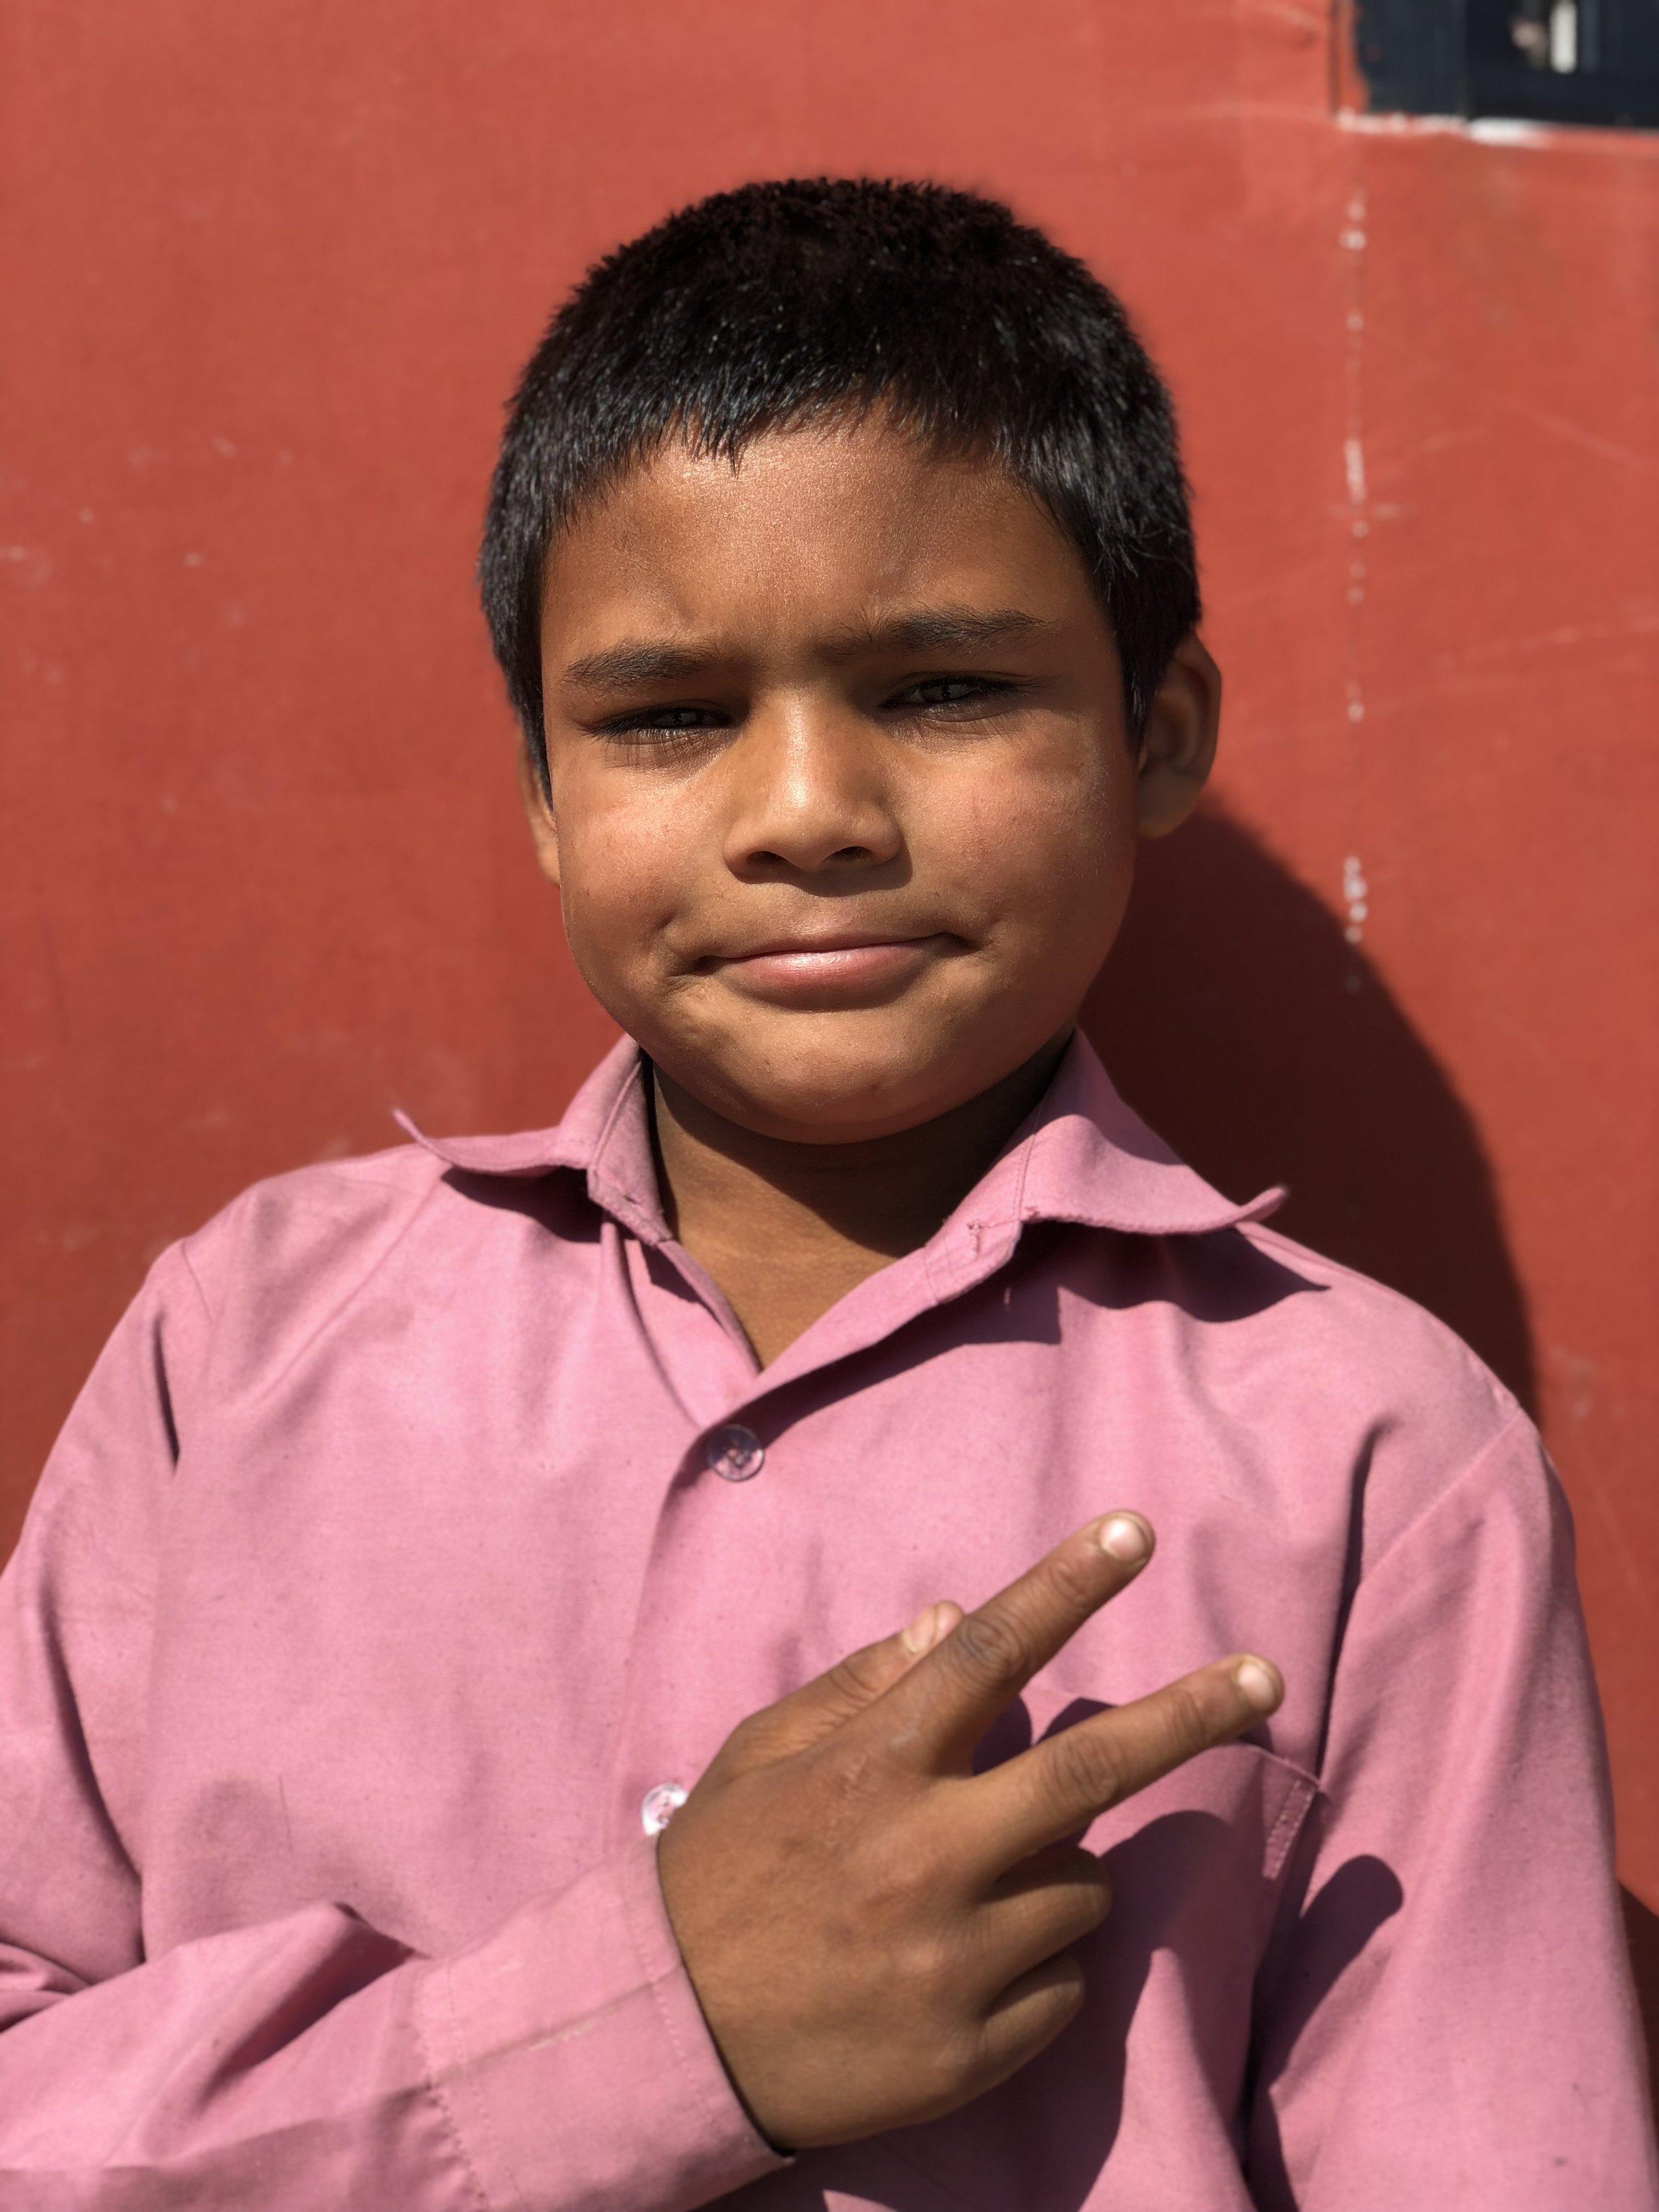 Arjun  Age 12  He likes to play football